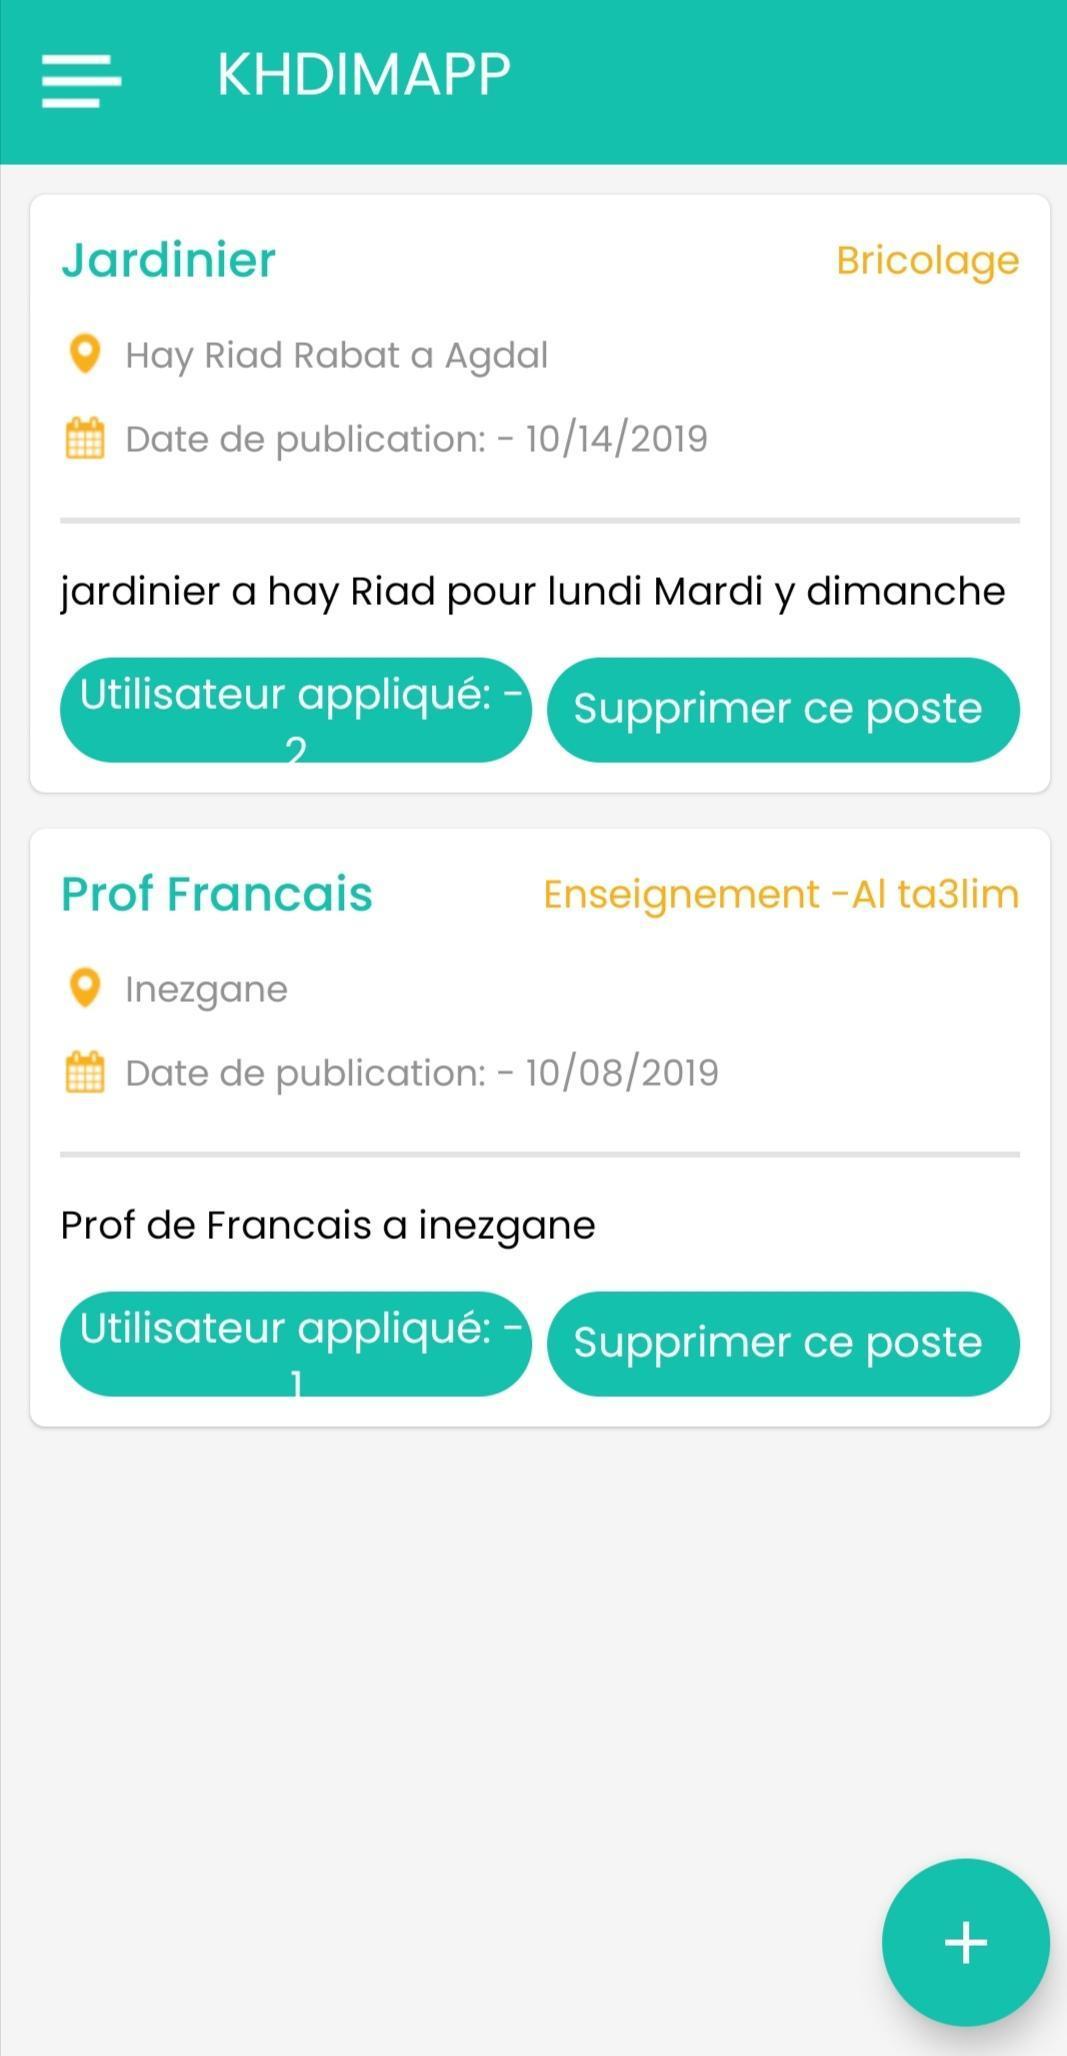 Trouver Un Jardinier A Domicile job - khdima lyouma for android - apk download